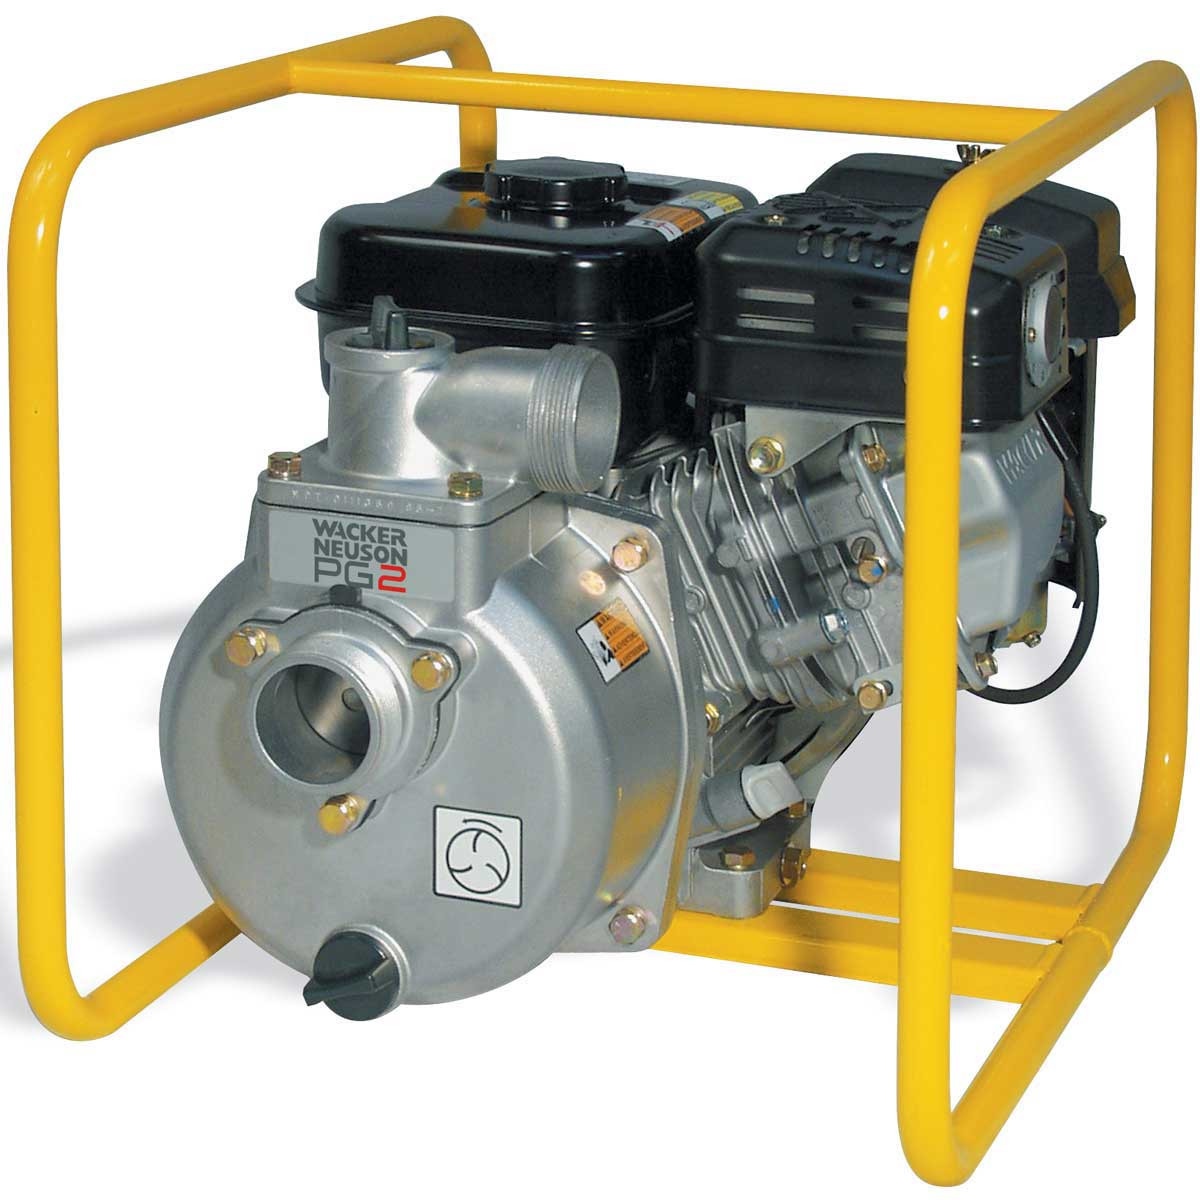 Wacker Neuson 2 inch Centrifugal Dewatering Pump